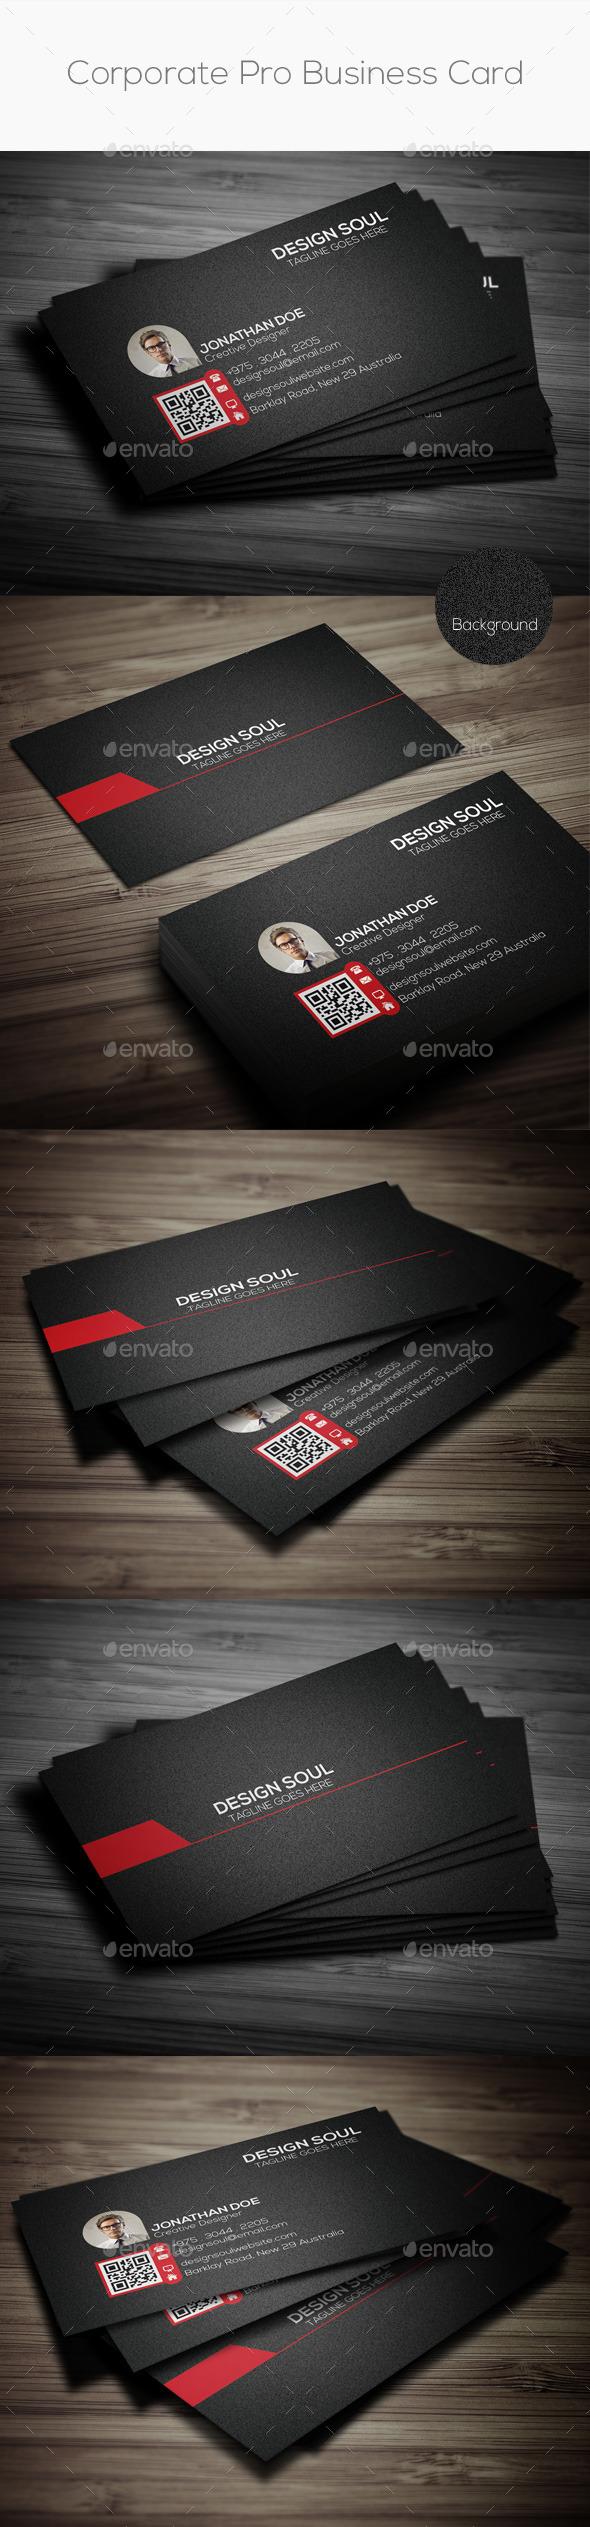 GraphicRiver Corporate Pro Business Card 8906327